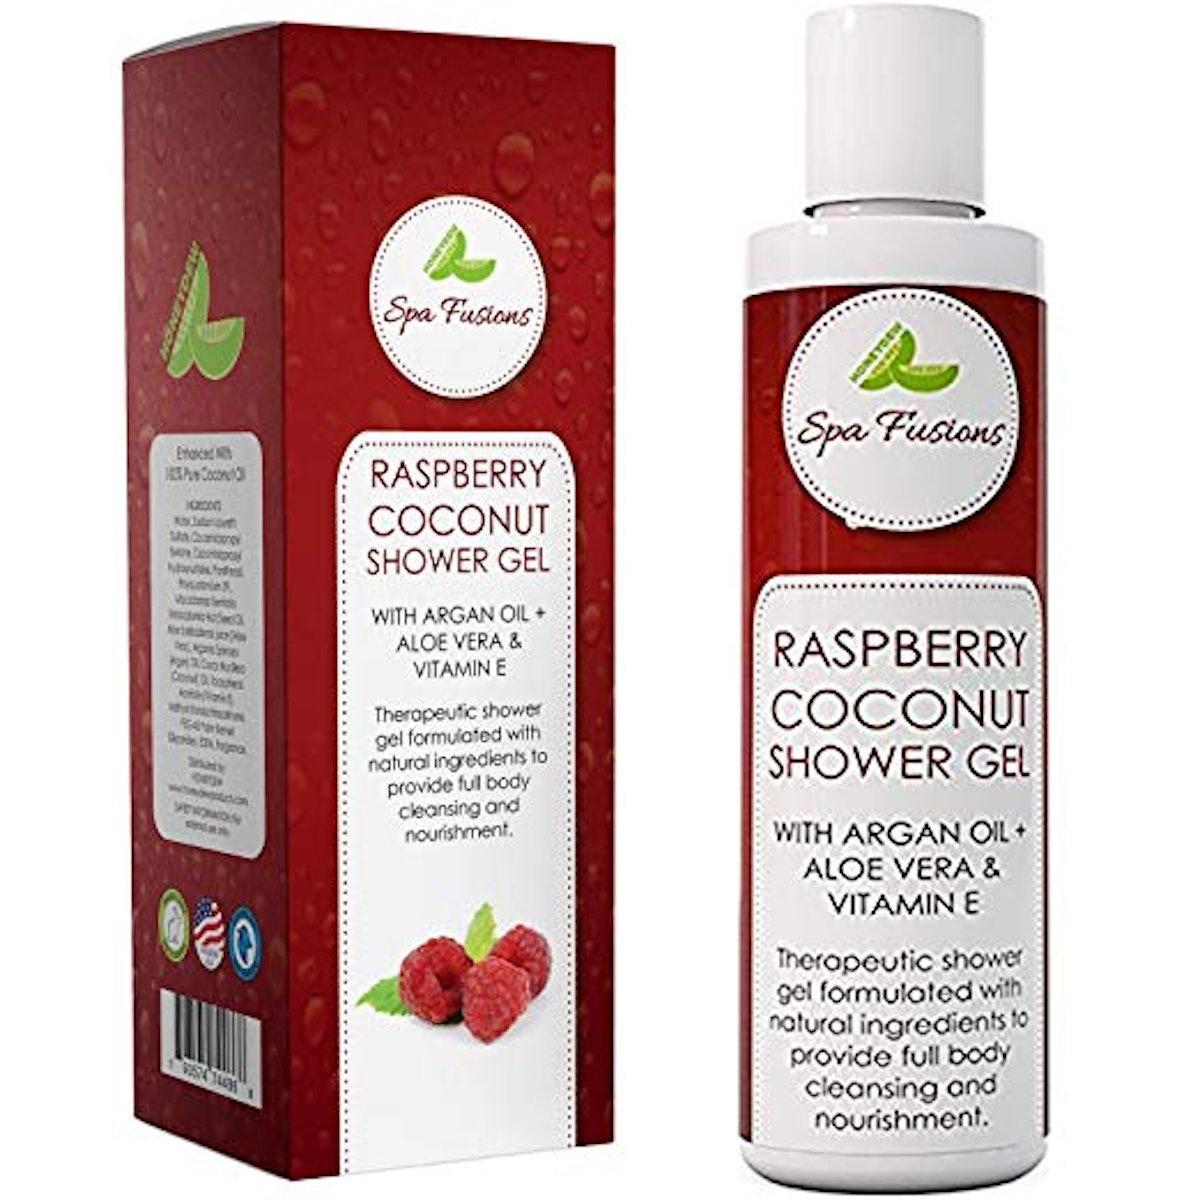 Spa Fusions Raspberry Coconut Shower Gel Oil